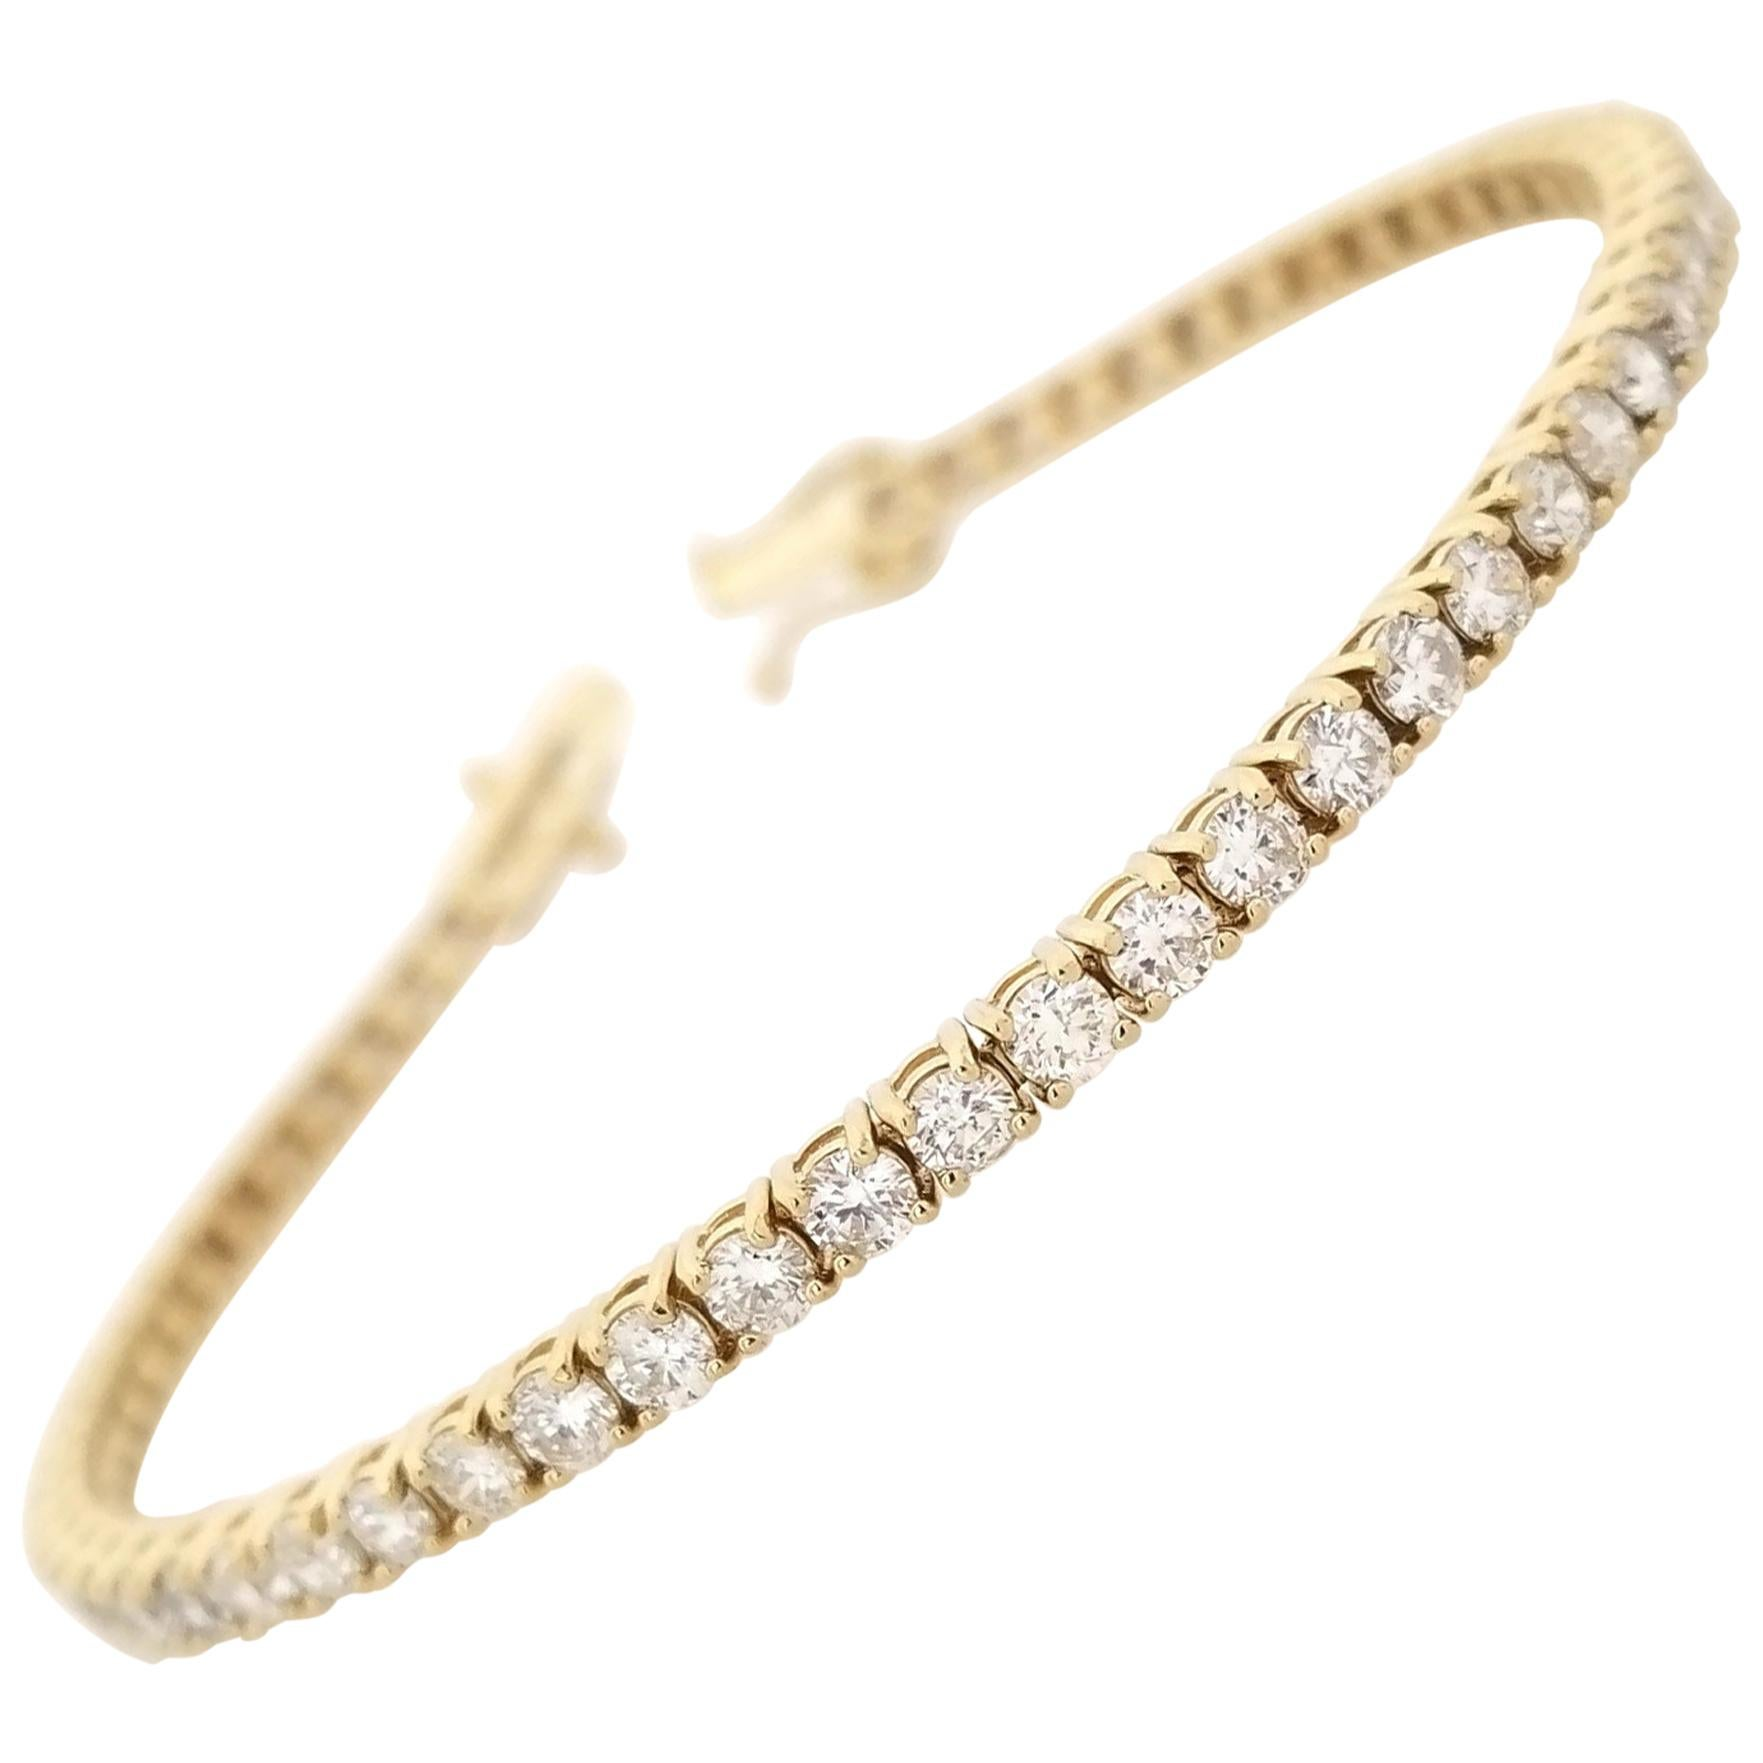 4.35 Carat Round Brilliant Cut Diamond Tennis Bracelet 14 Karat Yellow Gold 7''